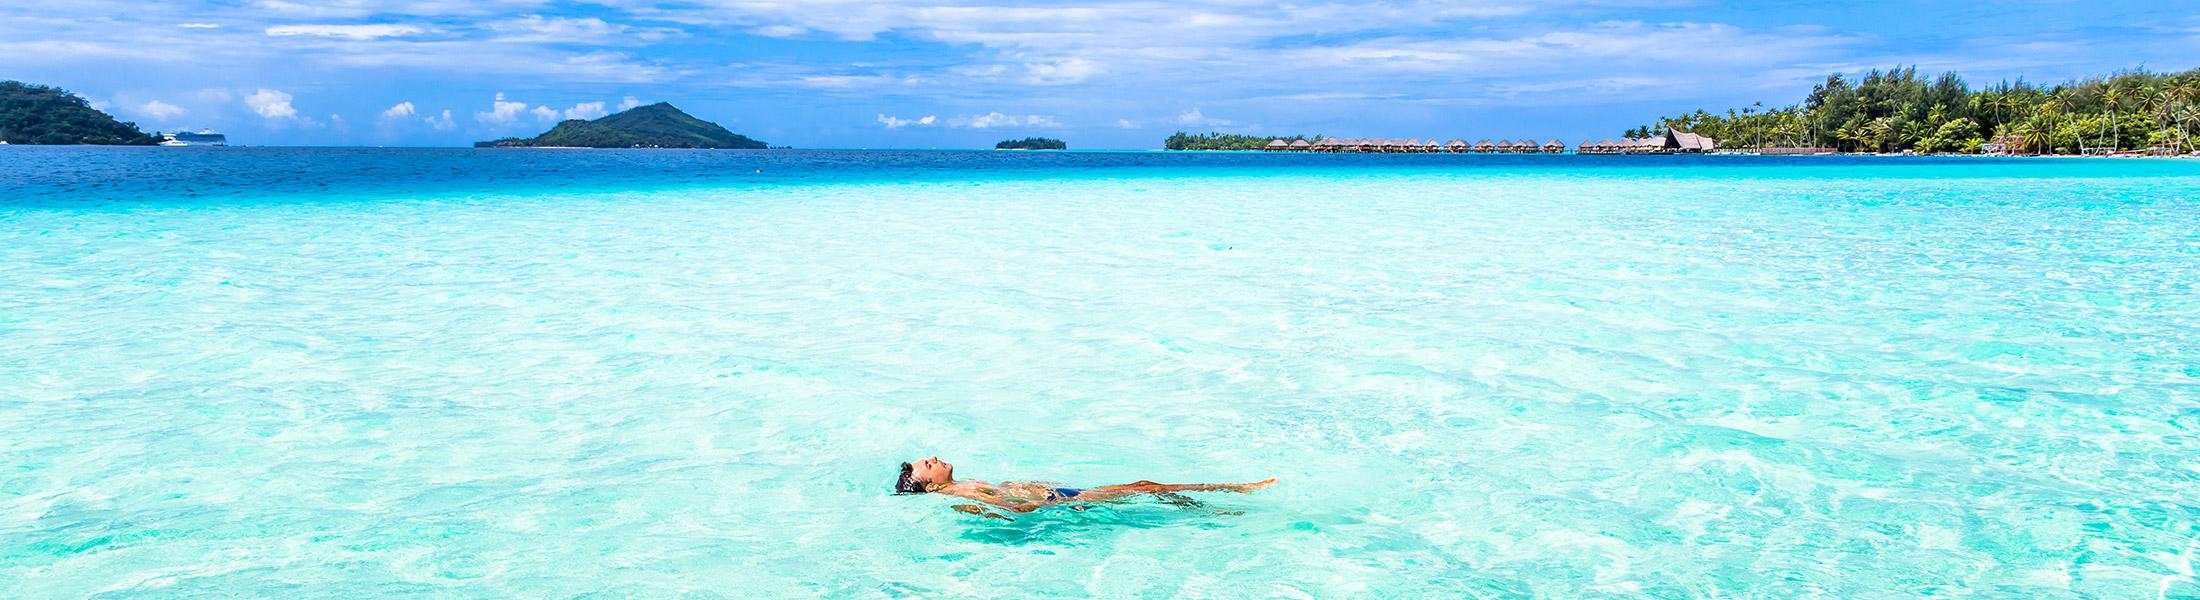 Man Swimming in blue waters in Bora Bora in the Pacific